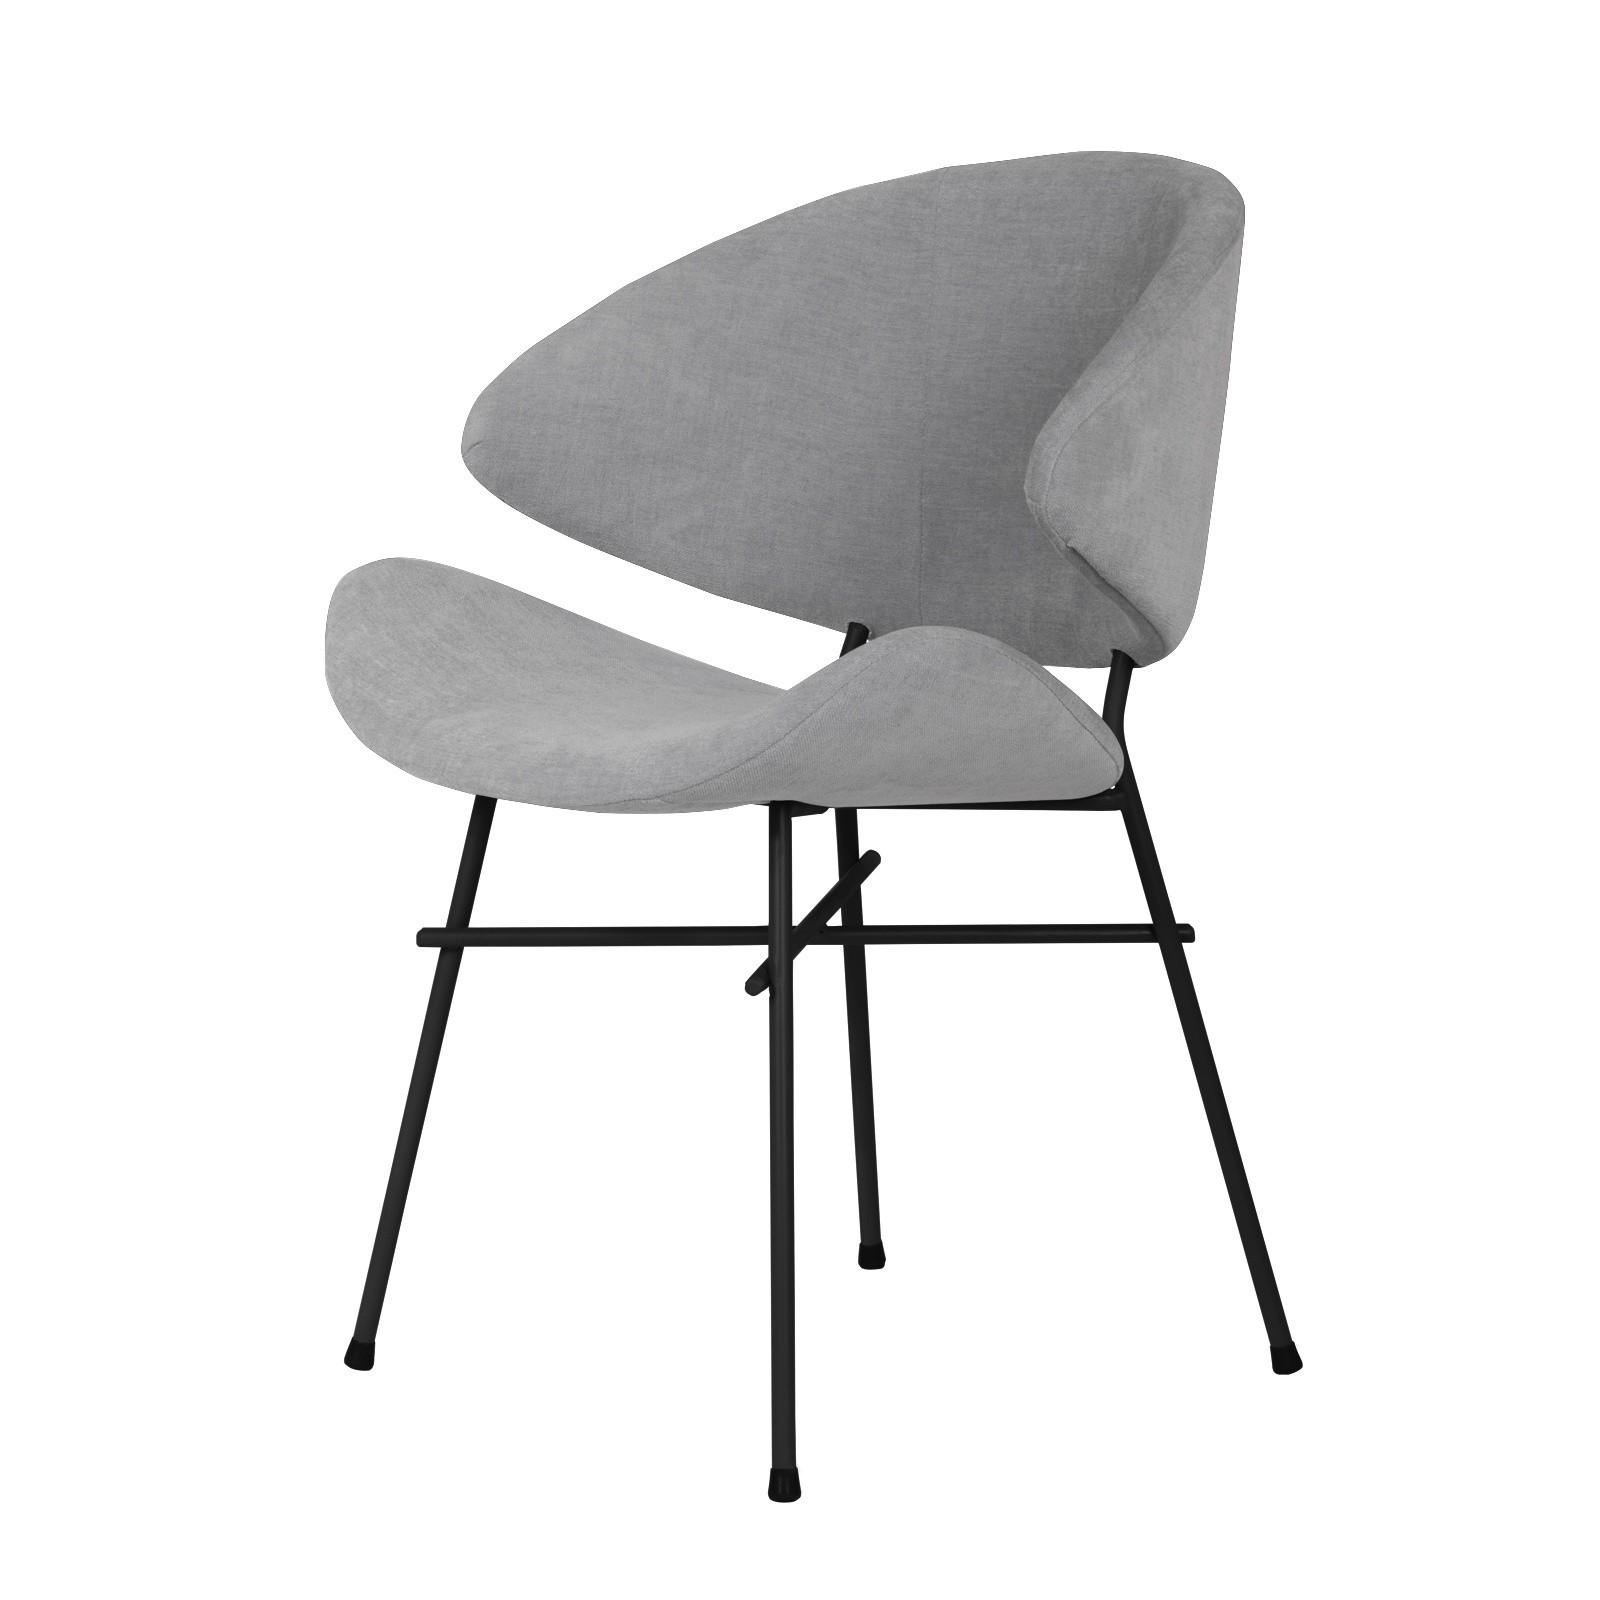 Cheri chair - trend -grey